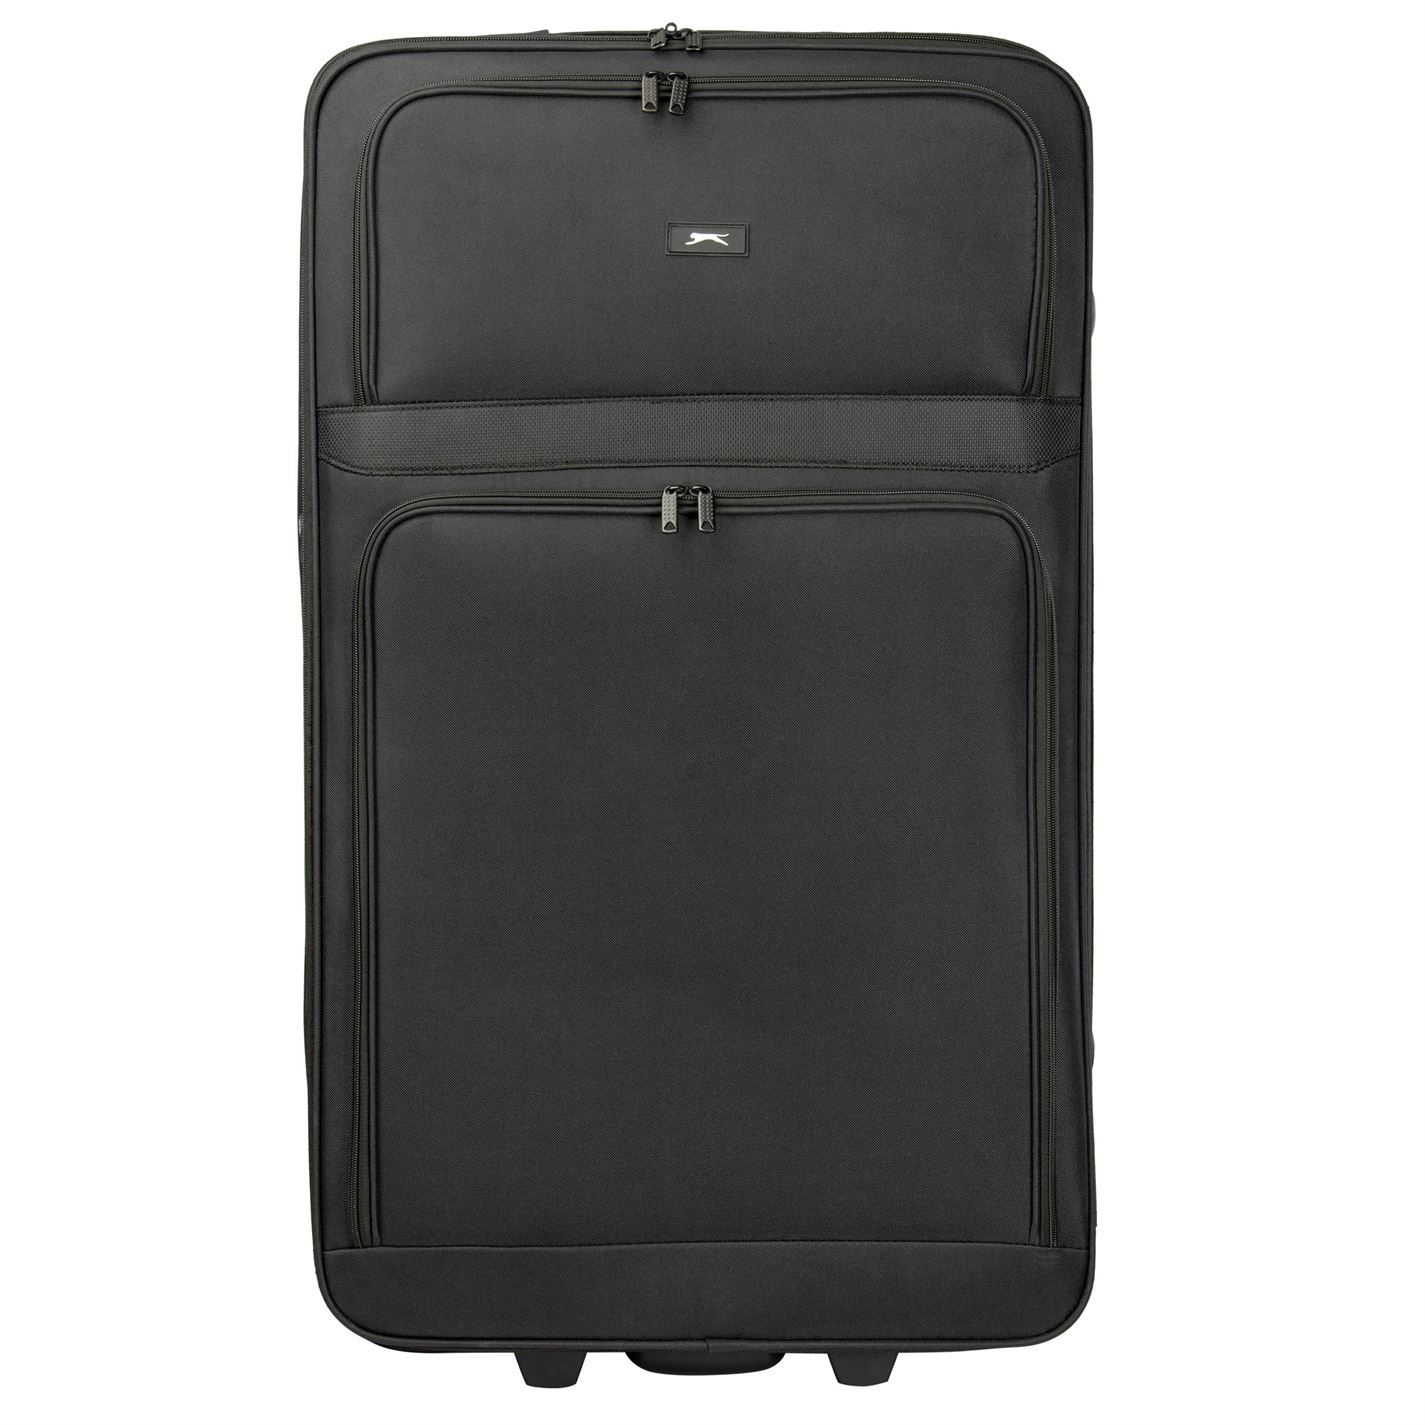 6a96c96fe1 Slazenger-Travel-Luggage-Lightweight-Wheeled-Holdall-Carryall-Trolley-